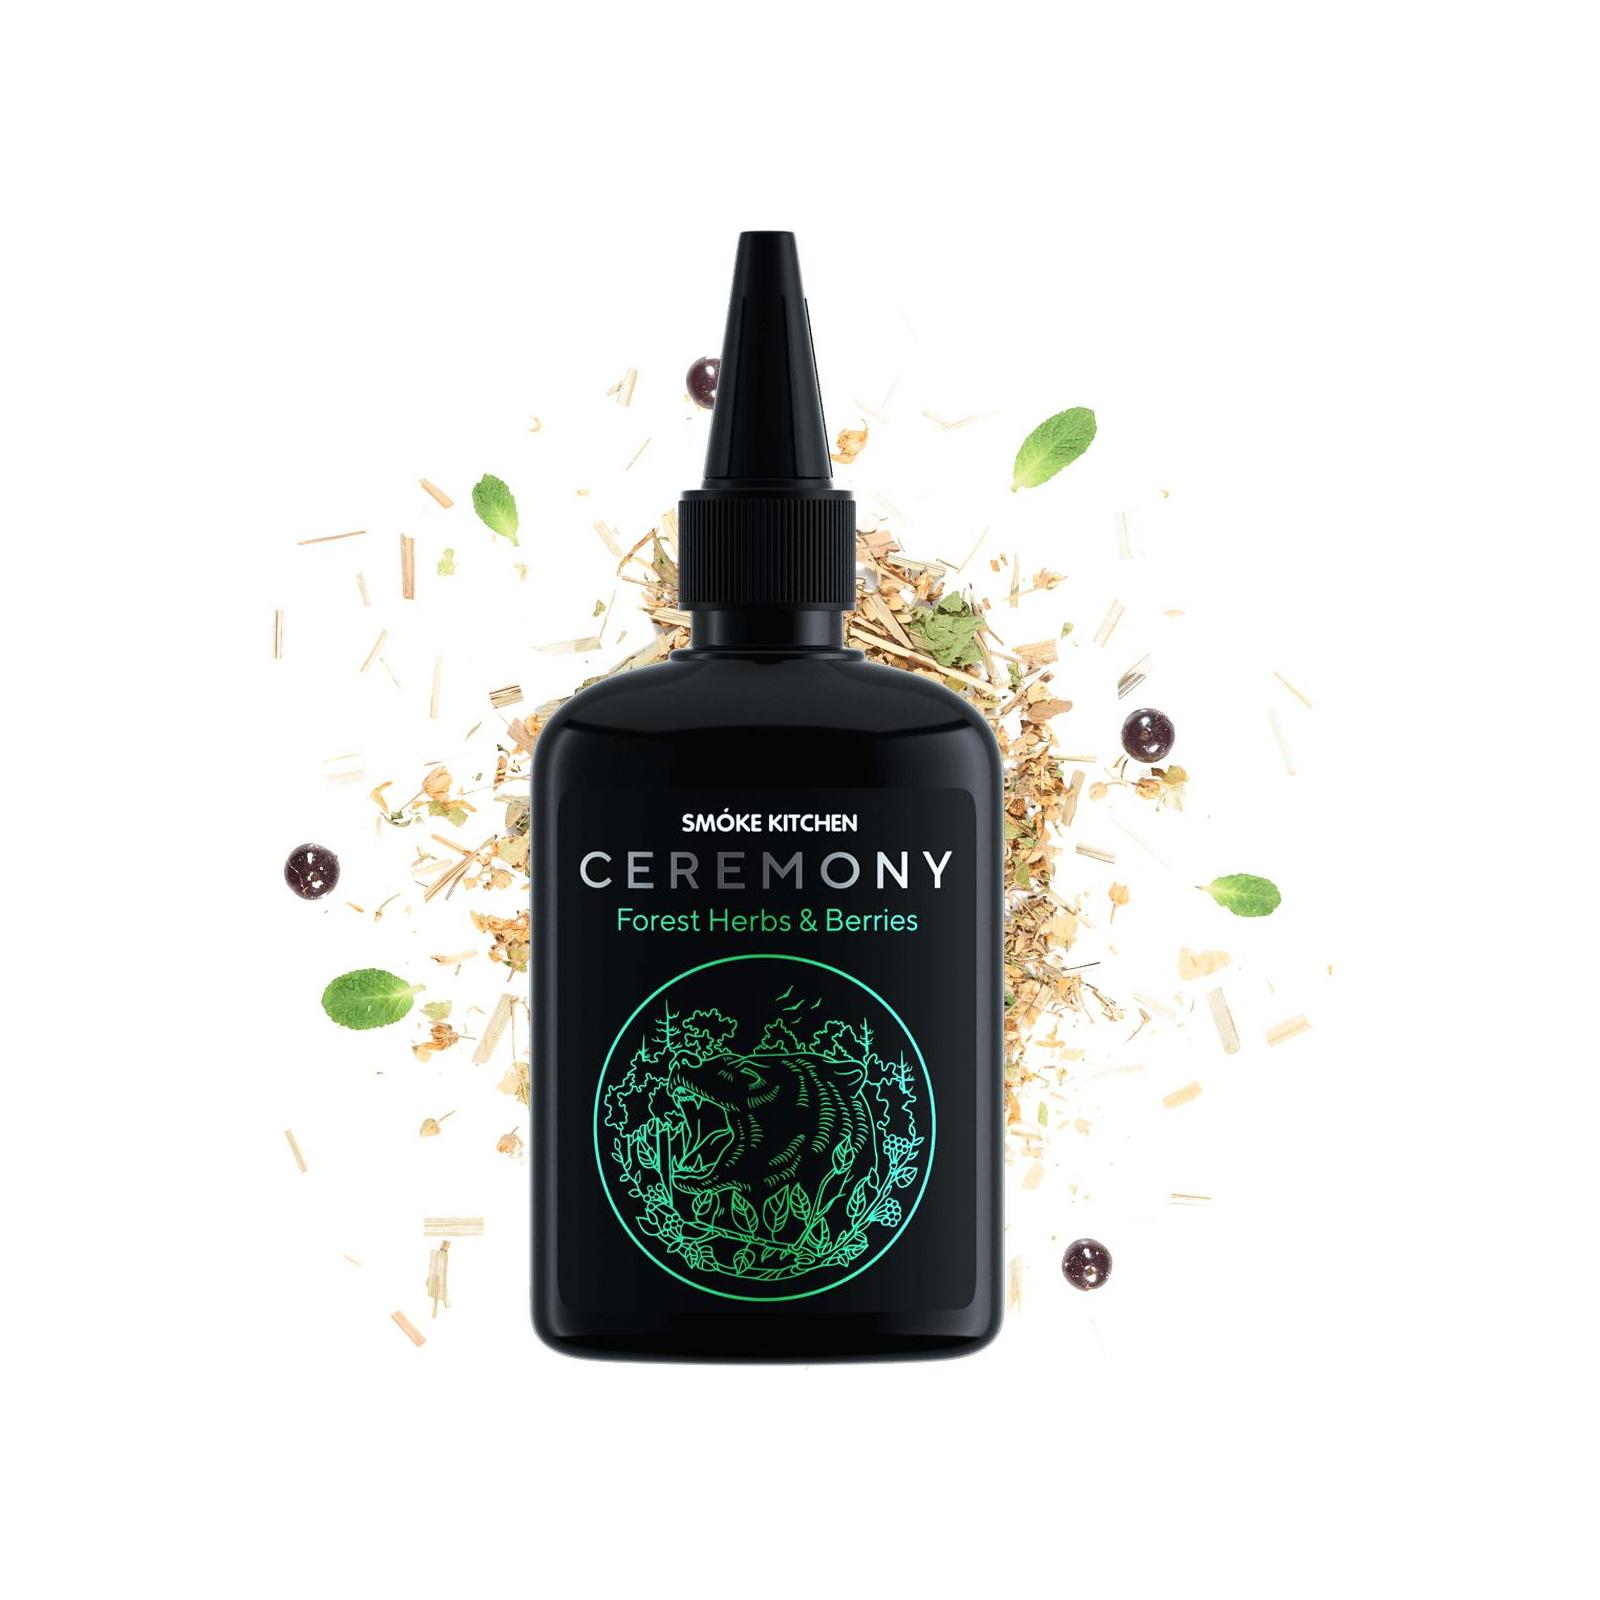 "Жидкость для электронных сигарет Smoke Kitchen Ceremony ""Forest herbs & Berries"" 100 ml 3 мг/мл (CRM-FH-3)"